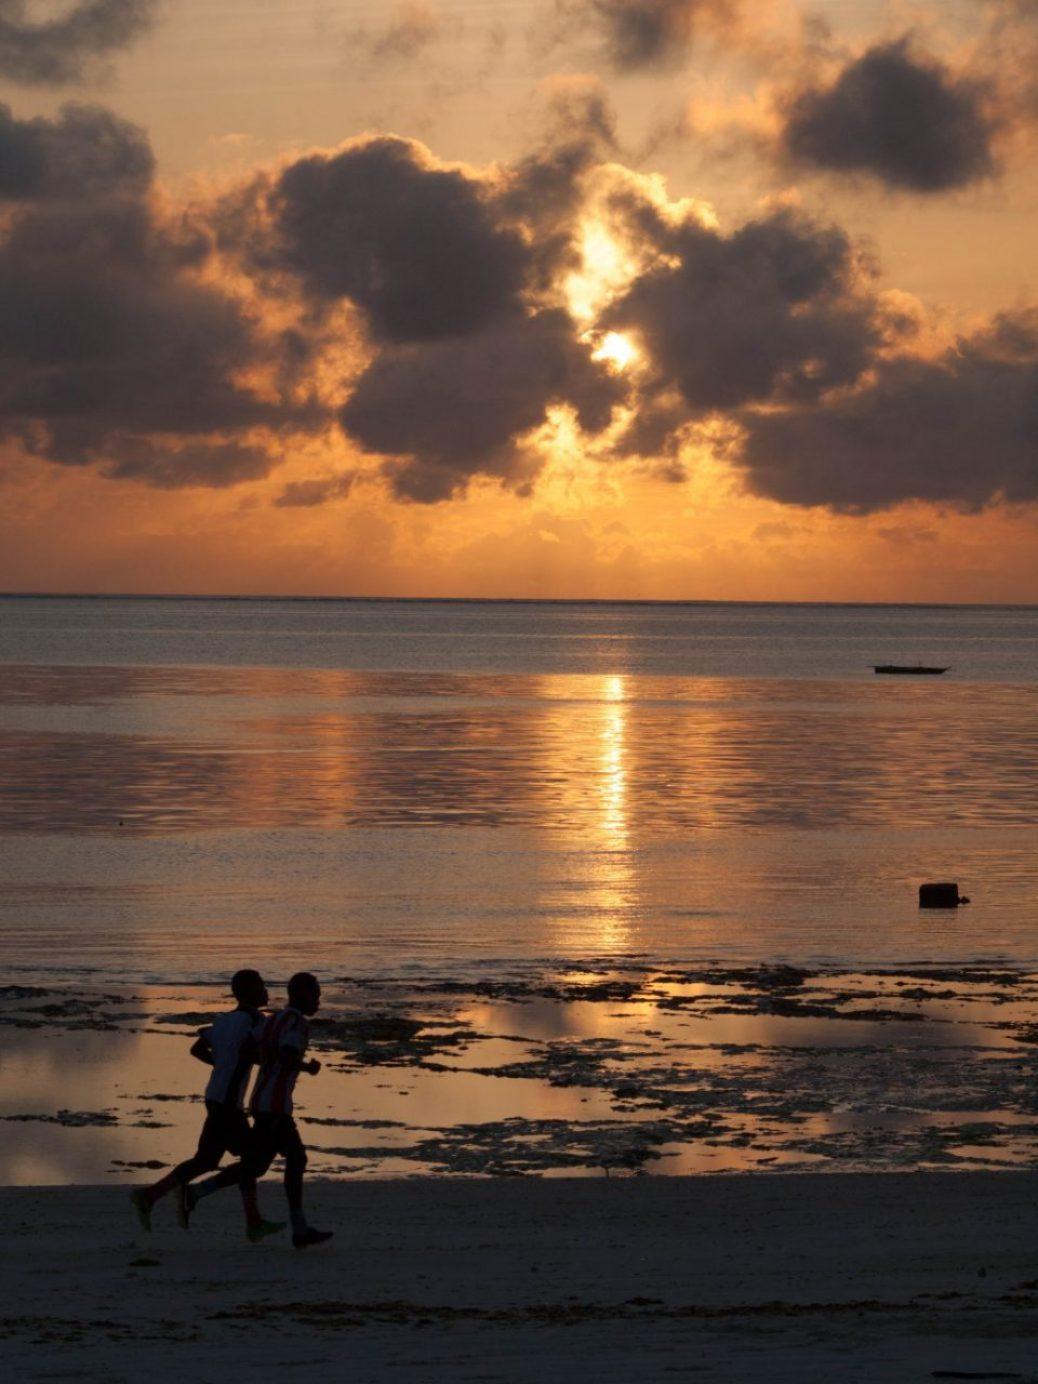 Sunset with Joggers in Zanzibar